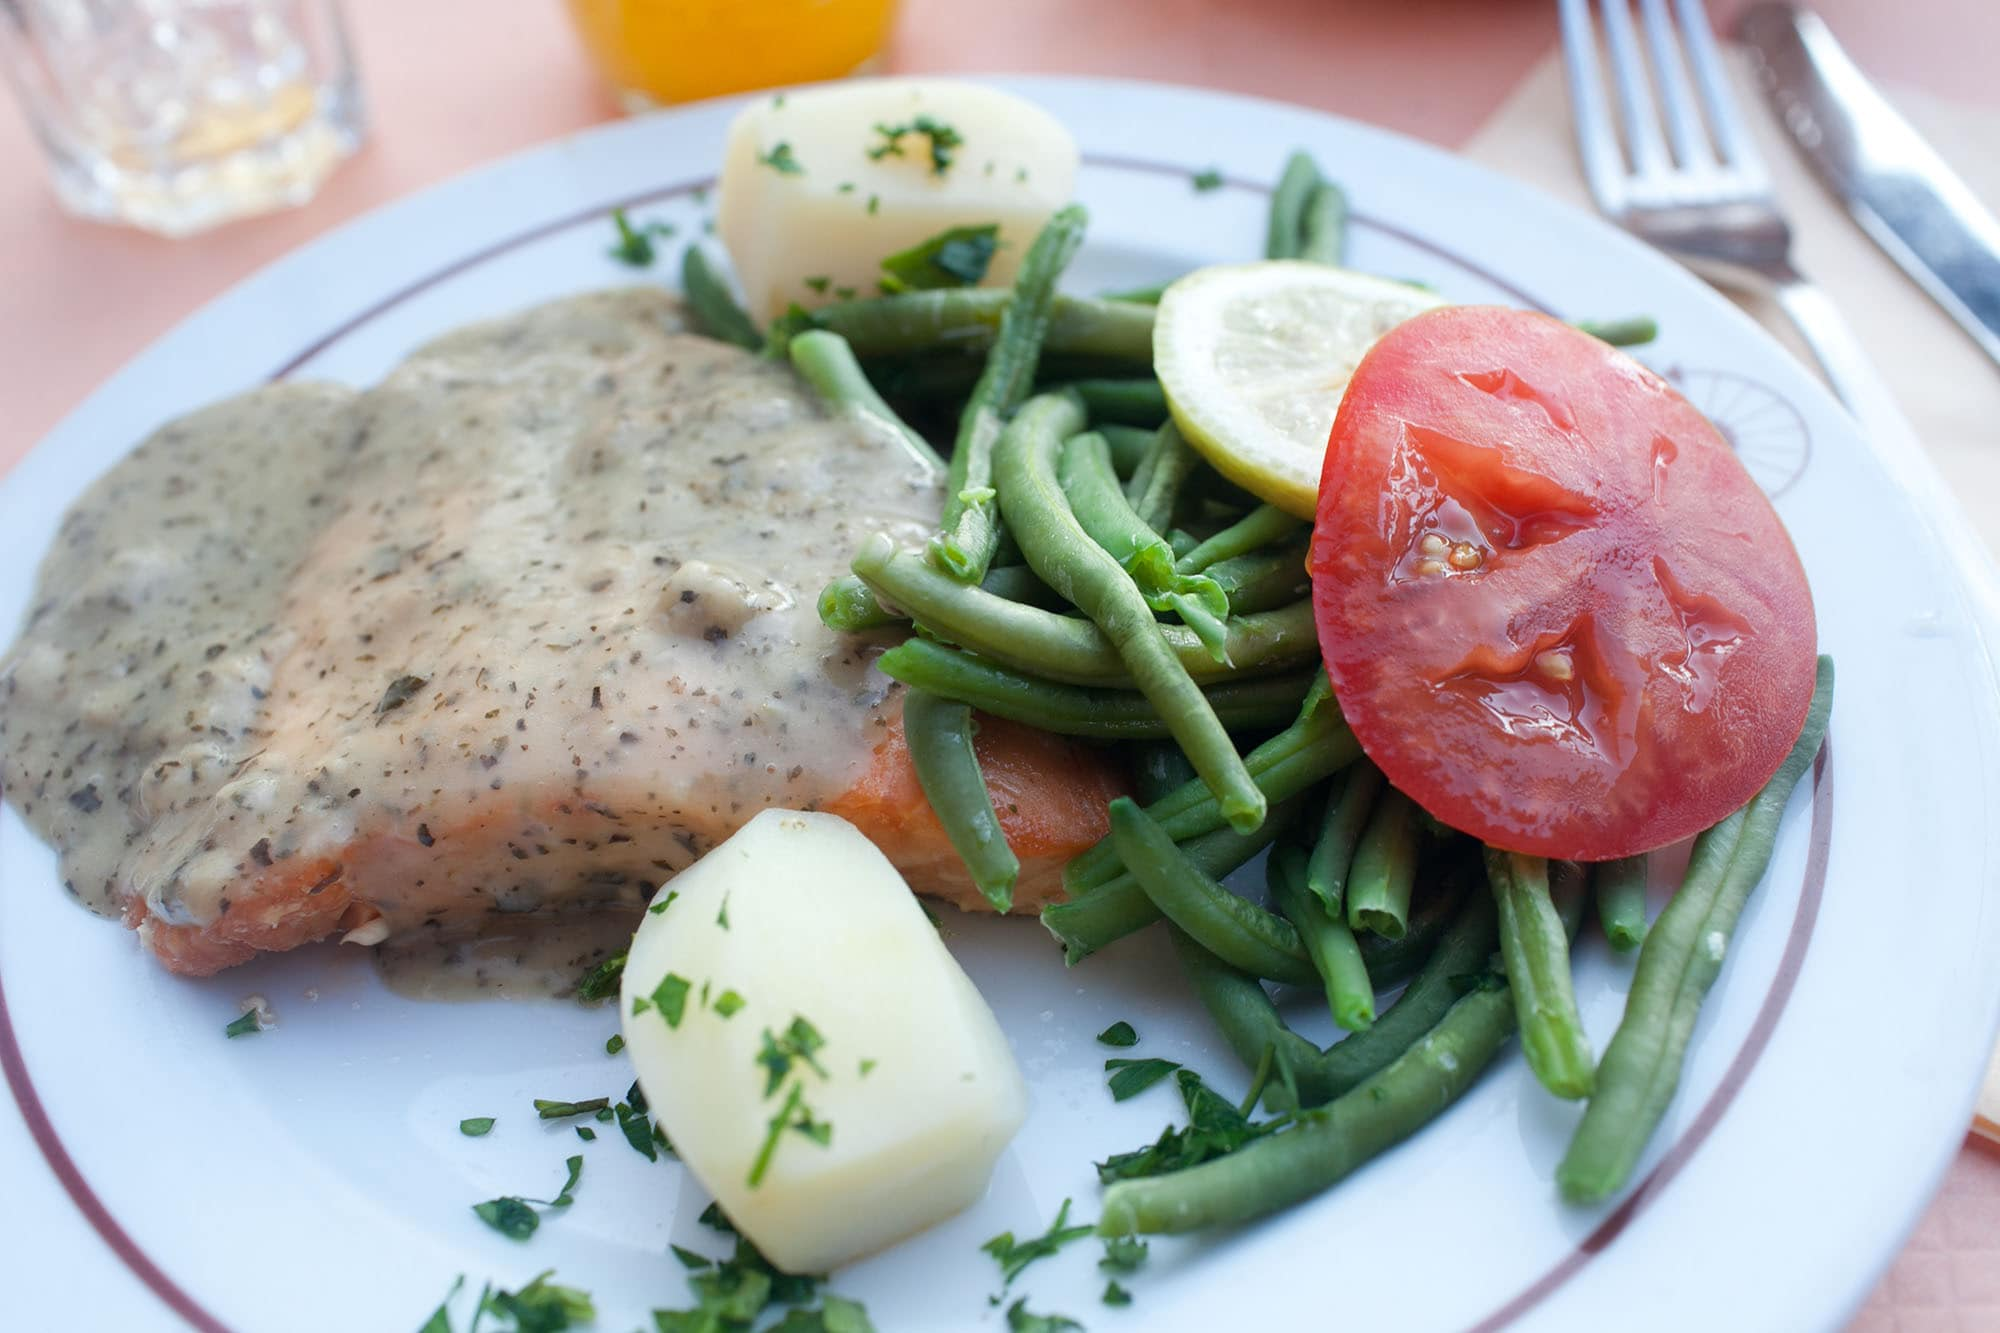 Salmon with basil sauce in Paris